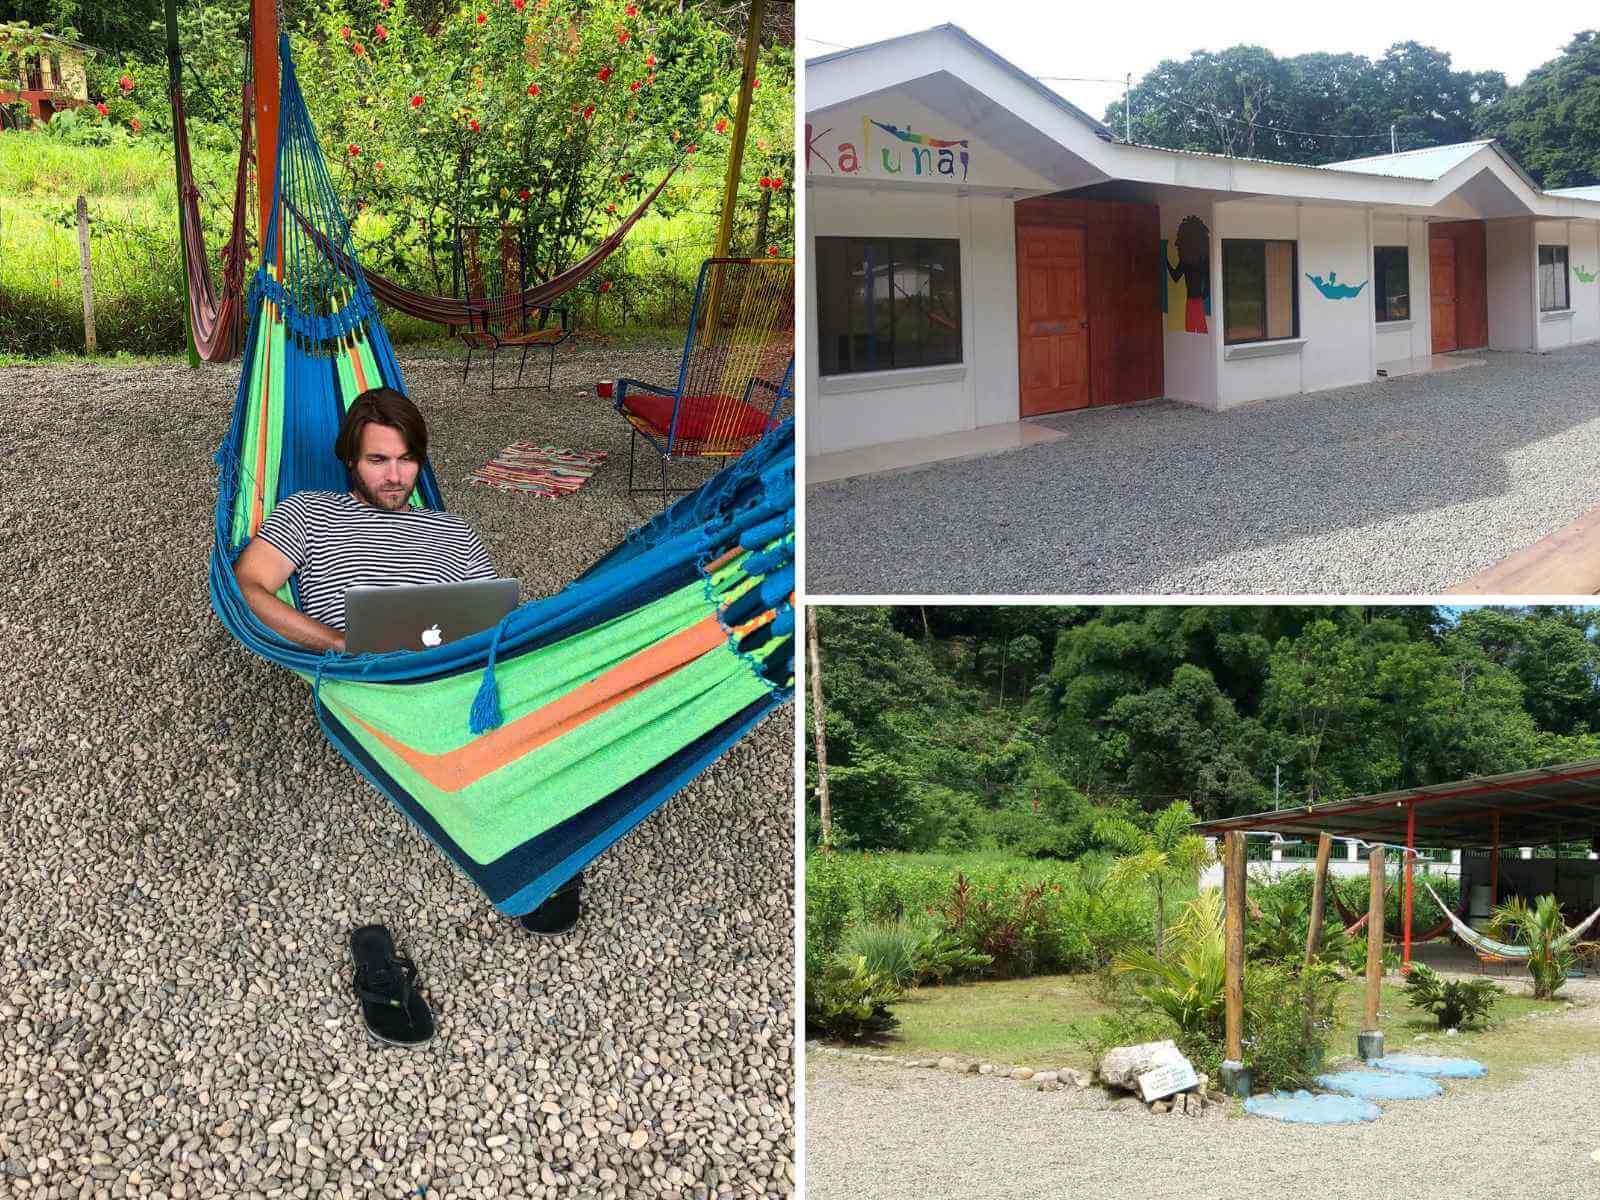 Hostels Puerto Viejo: Kalunai hostel